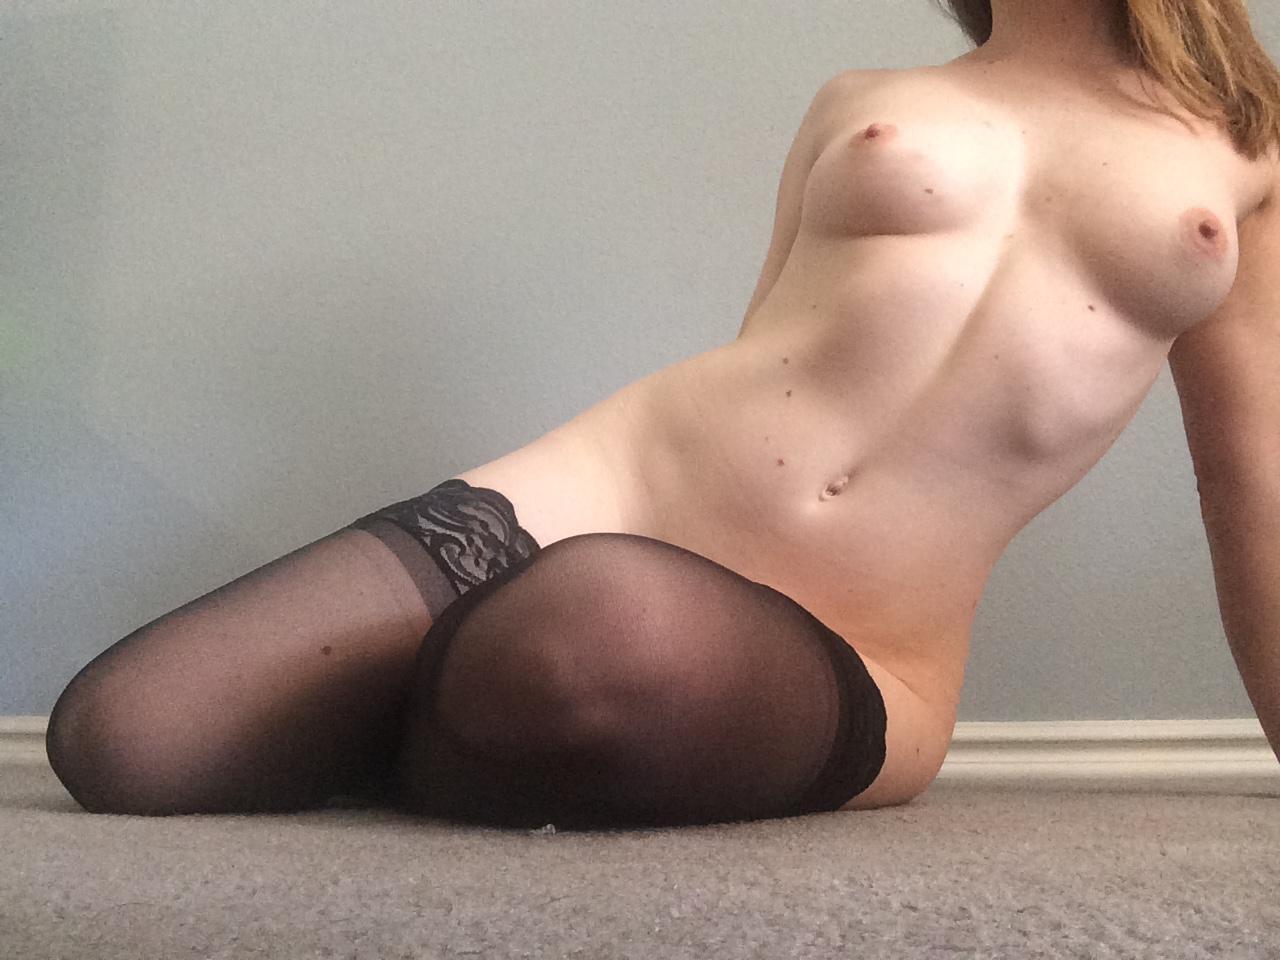 thigh highs porn